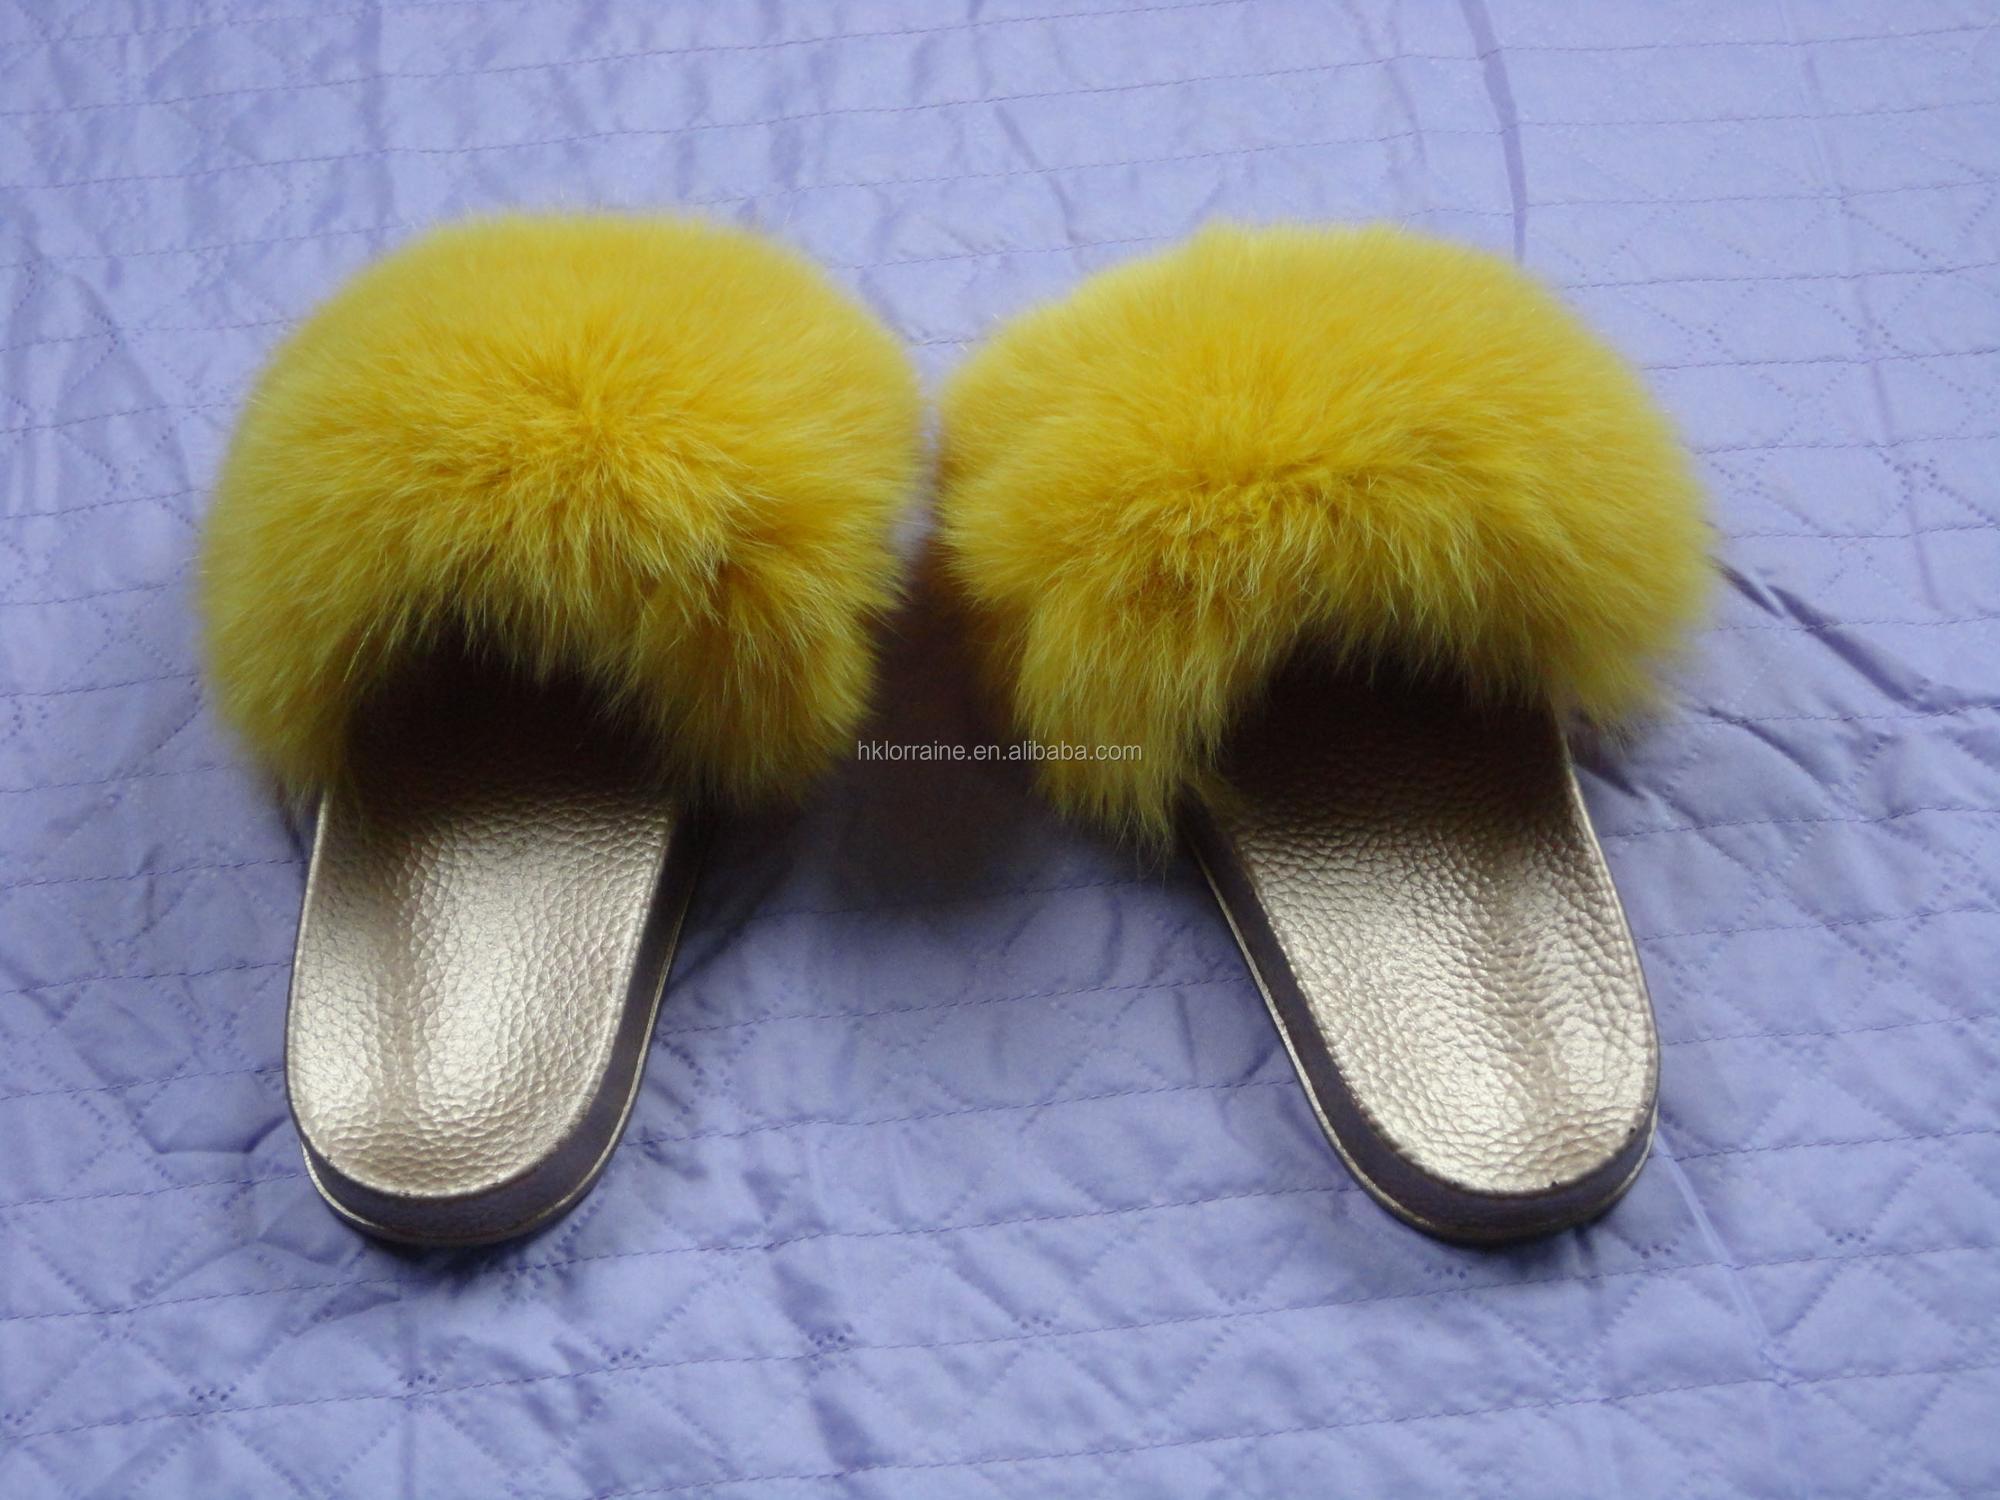 9b5ae1d1b4022 Fur Slides Women Ostrich Home Slippers Feathers Fluffy 44 Sweet Sandals  Beach Shoes Summer Pantufa Fashion Sliders Flip Flops - Buy Fox Fur Shoes  ...